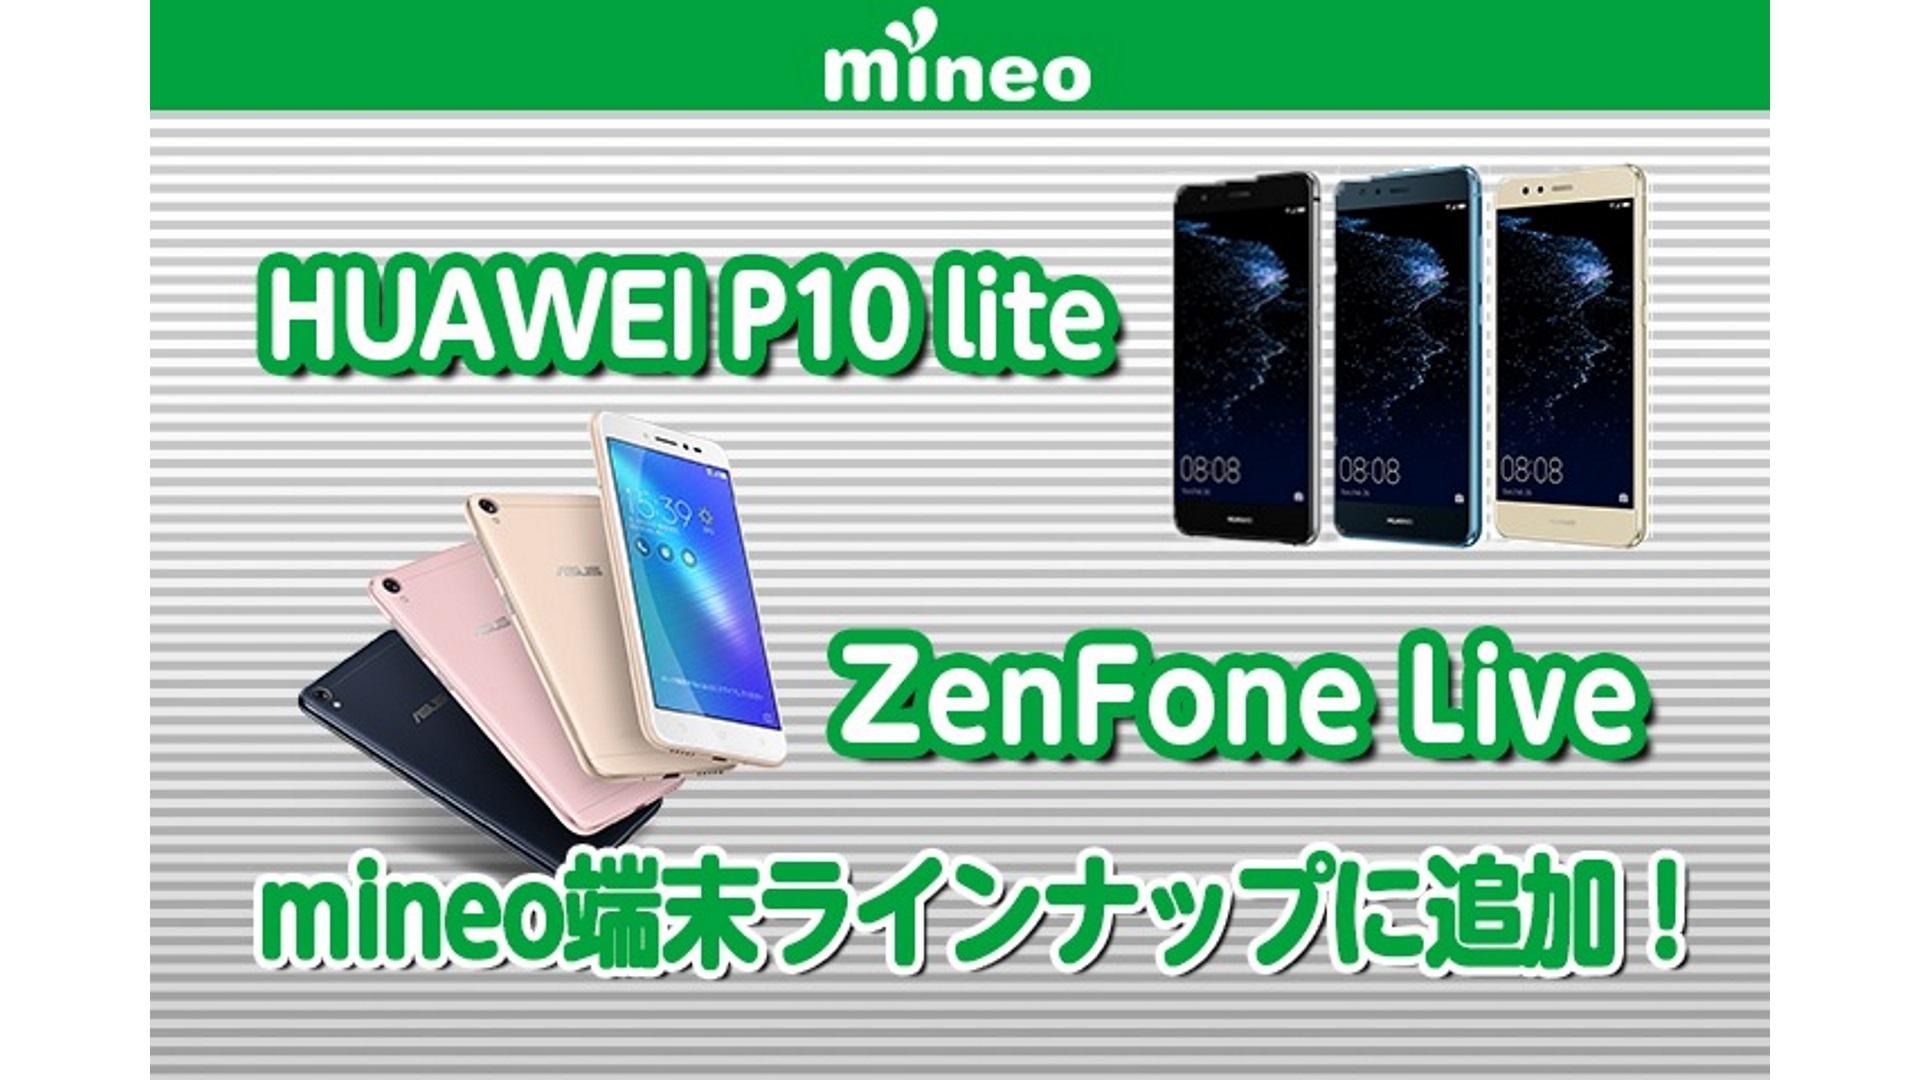 mineo「Huawei P10 lite」「ZenFone Live」を発売